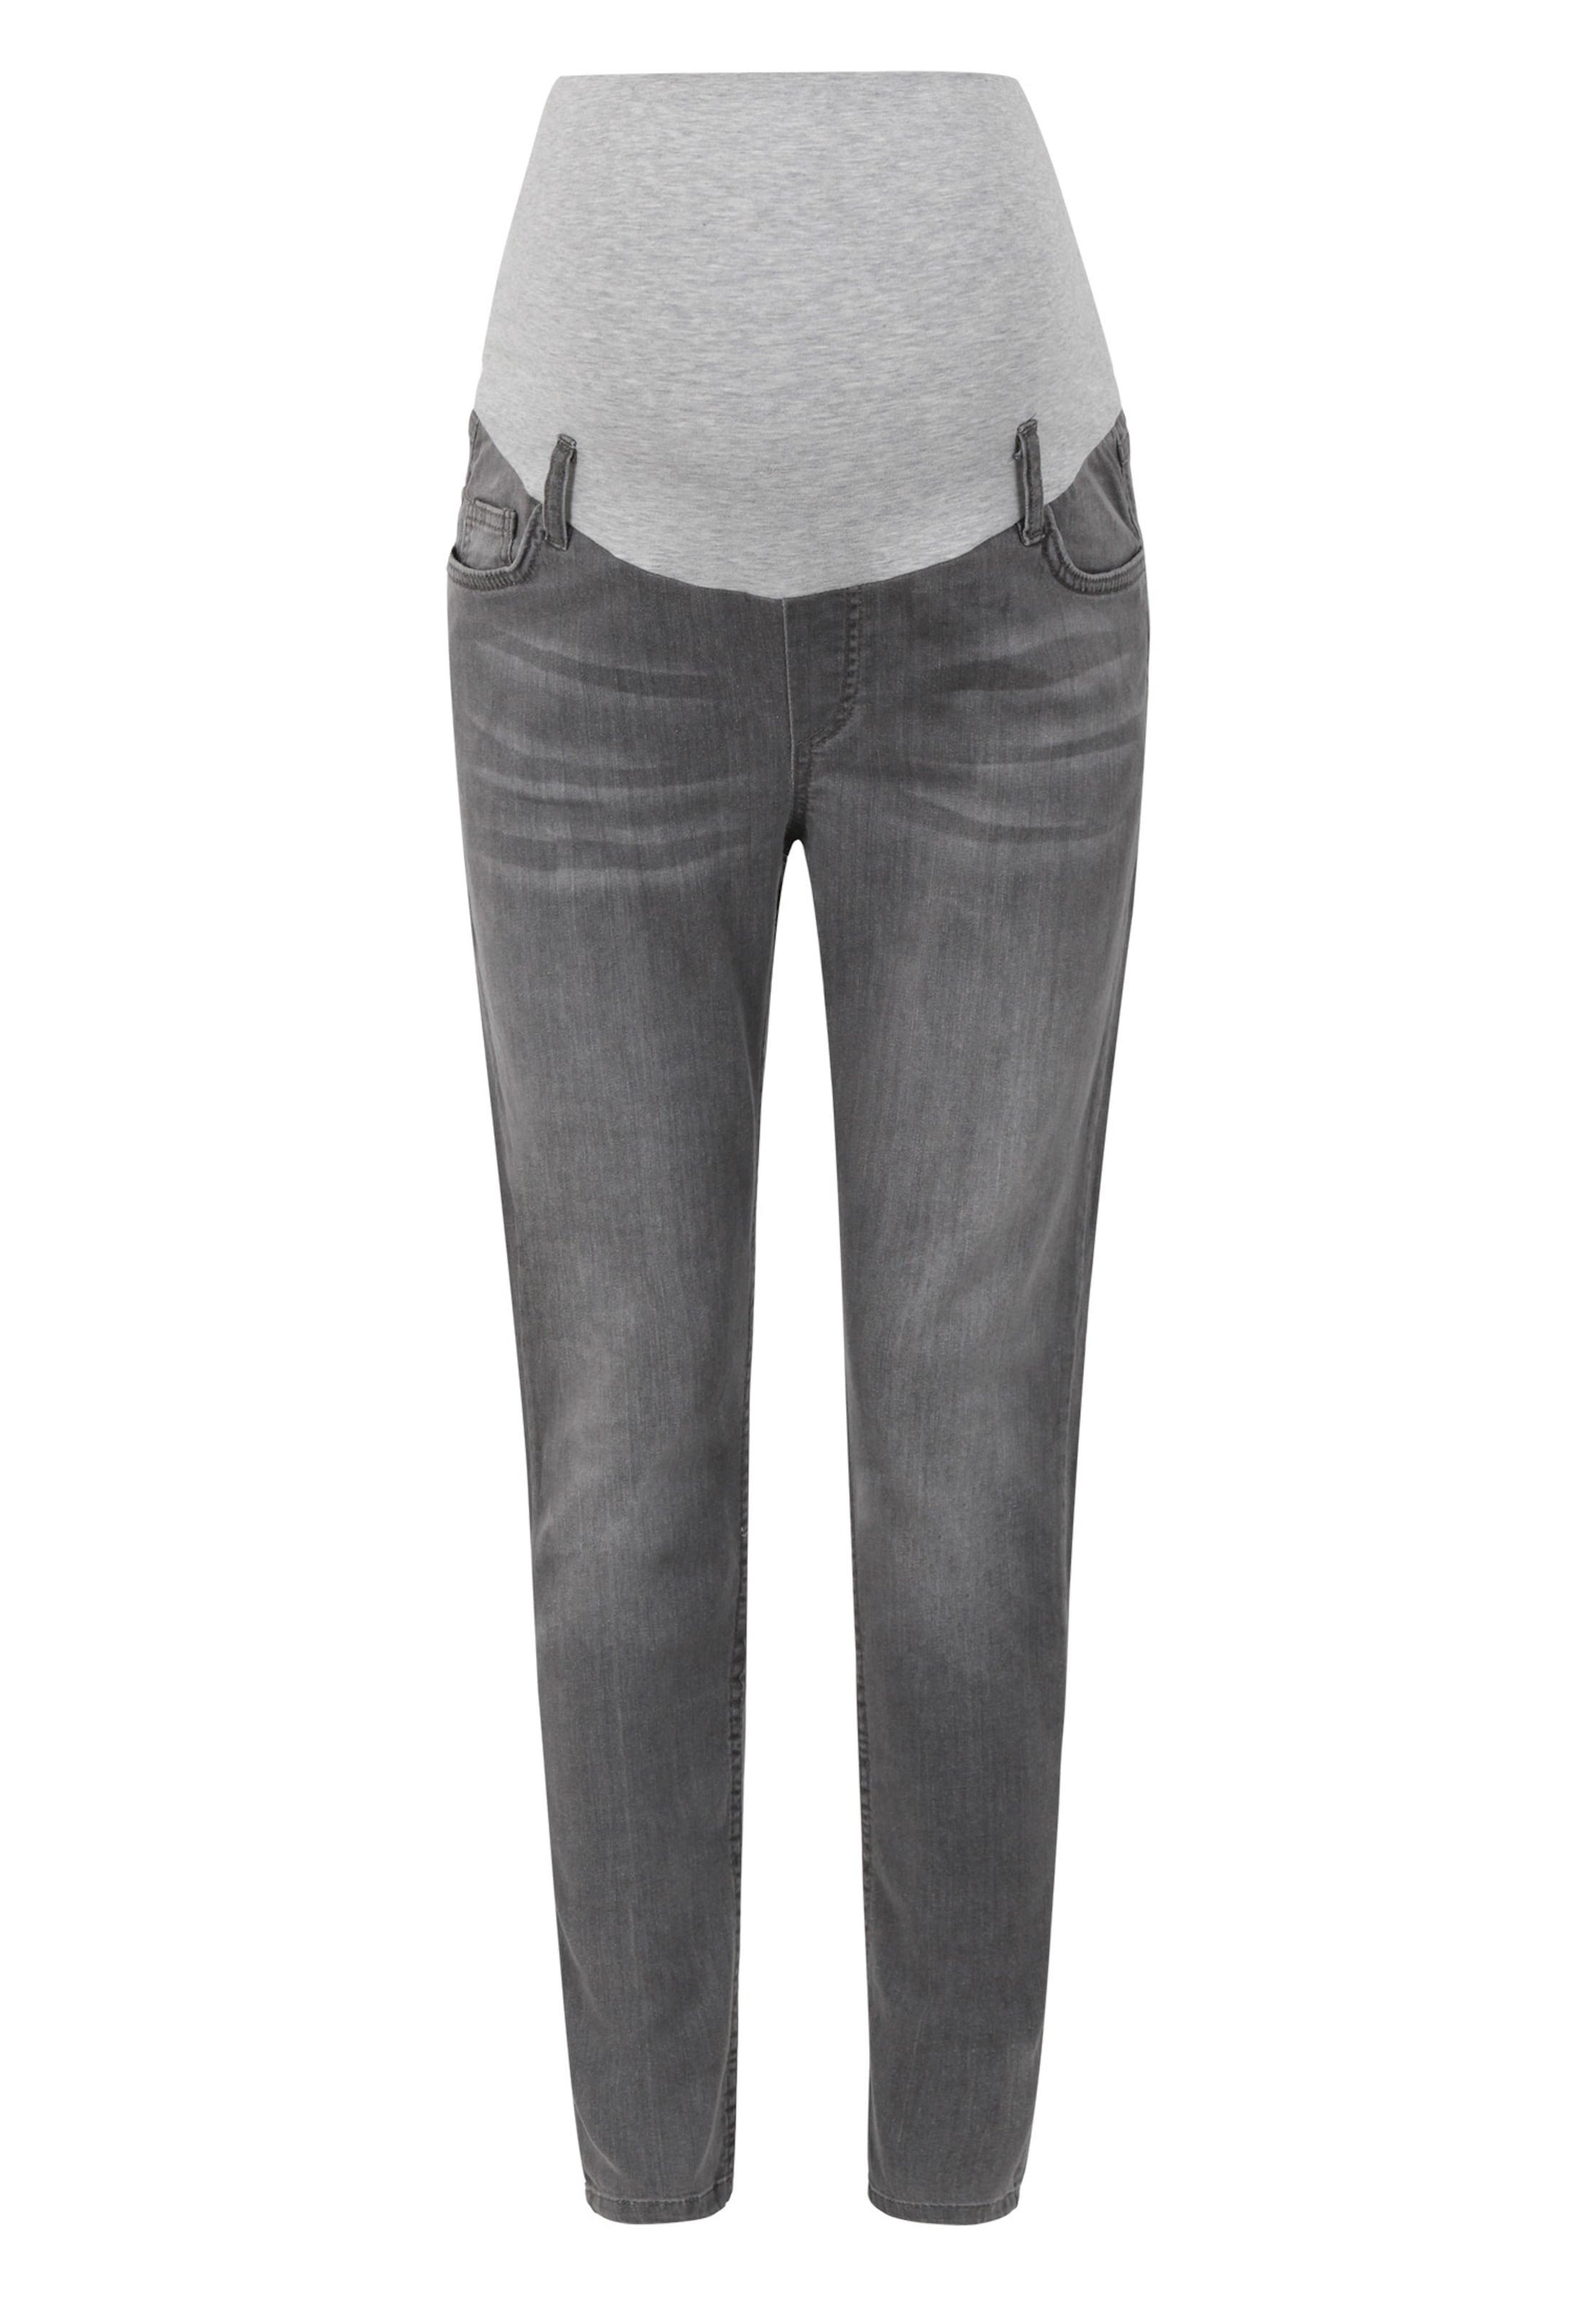 Denim In Bellybutton Jeans Jeans Denim Jeans In Bellybutton Grey Bellybutton Grey n0OywmNv8